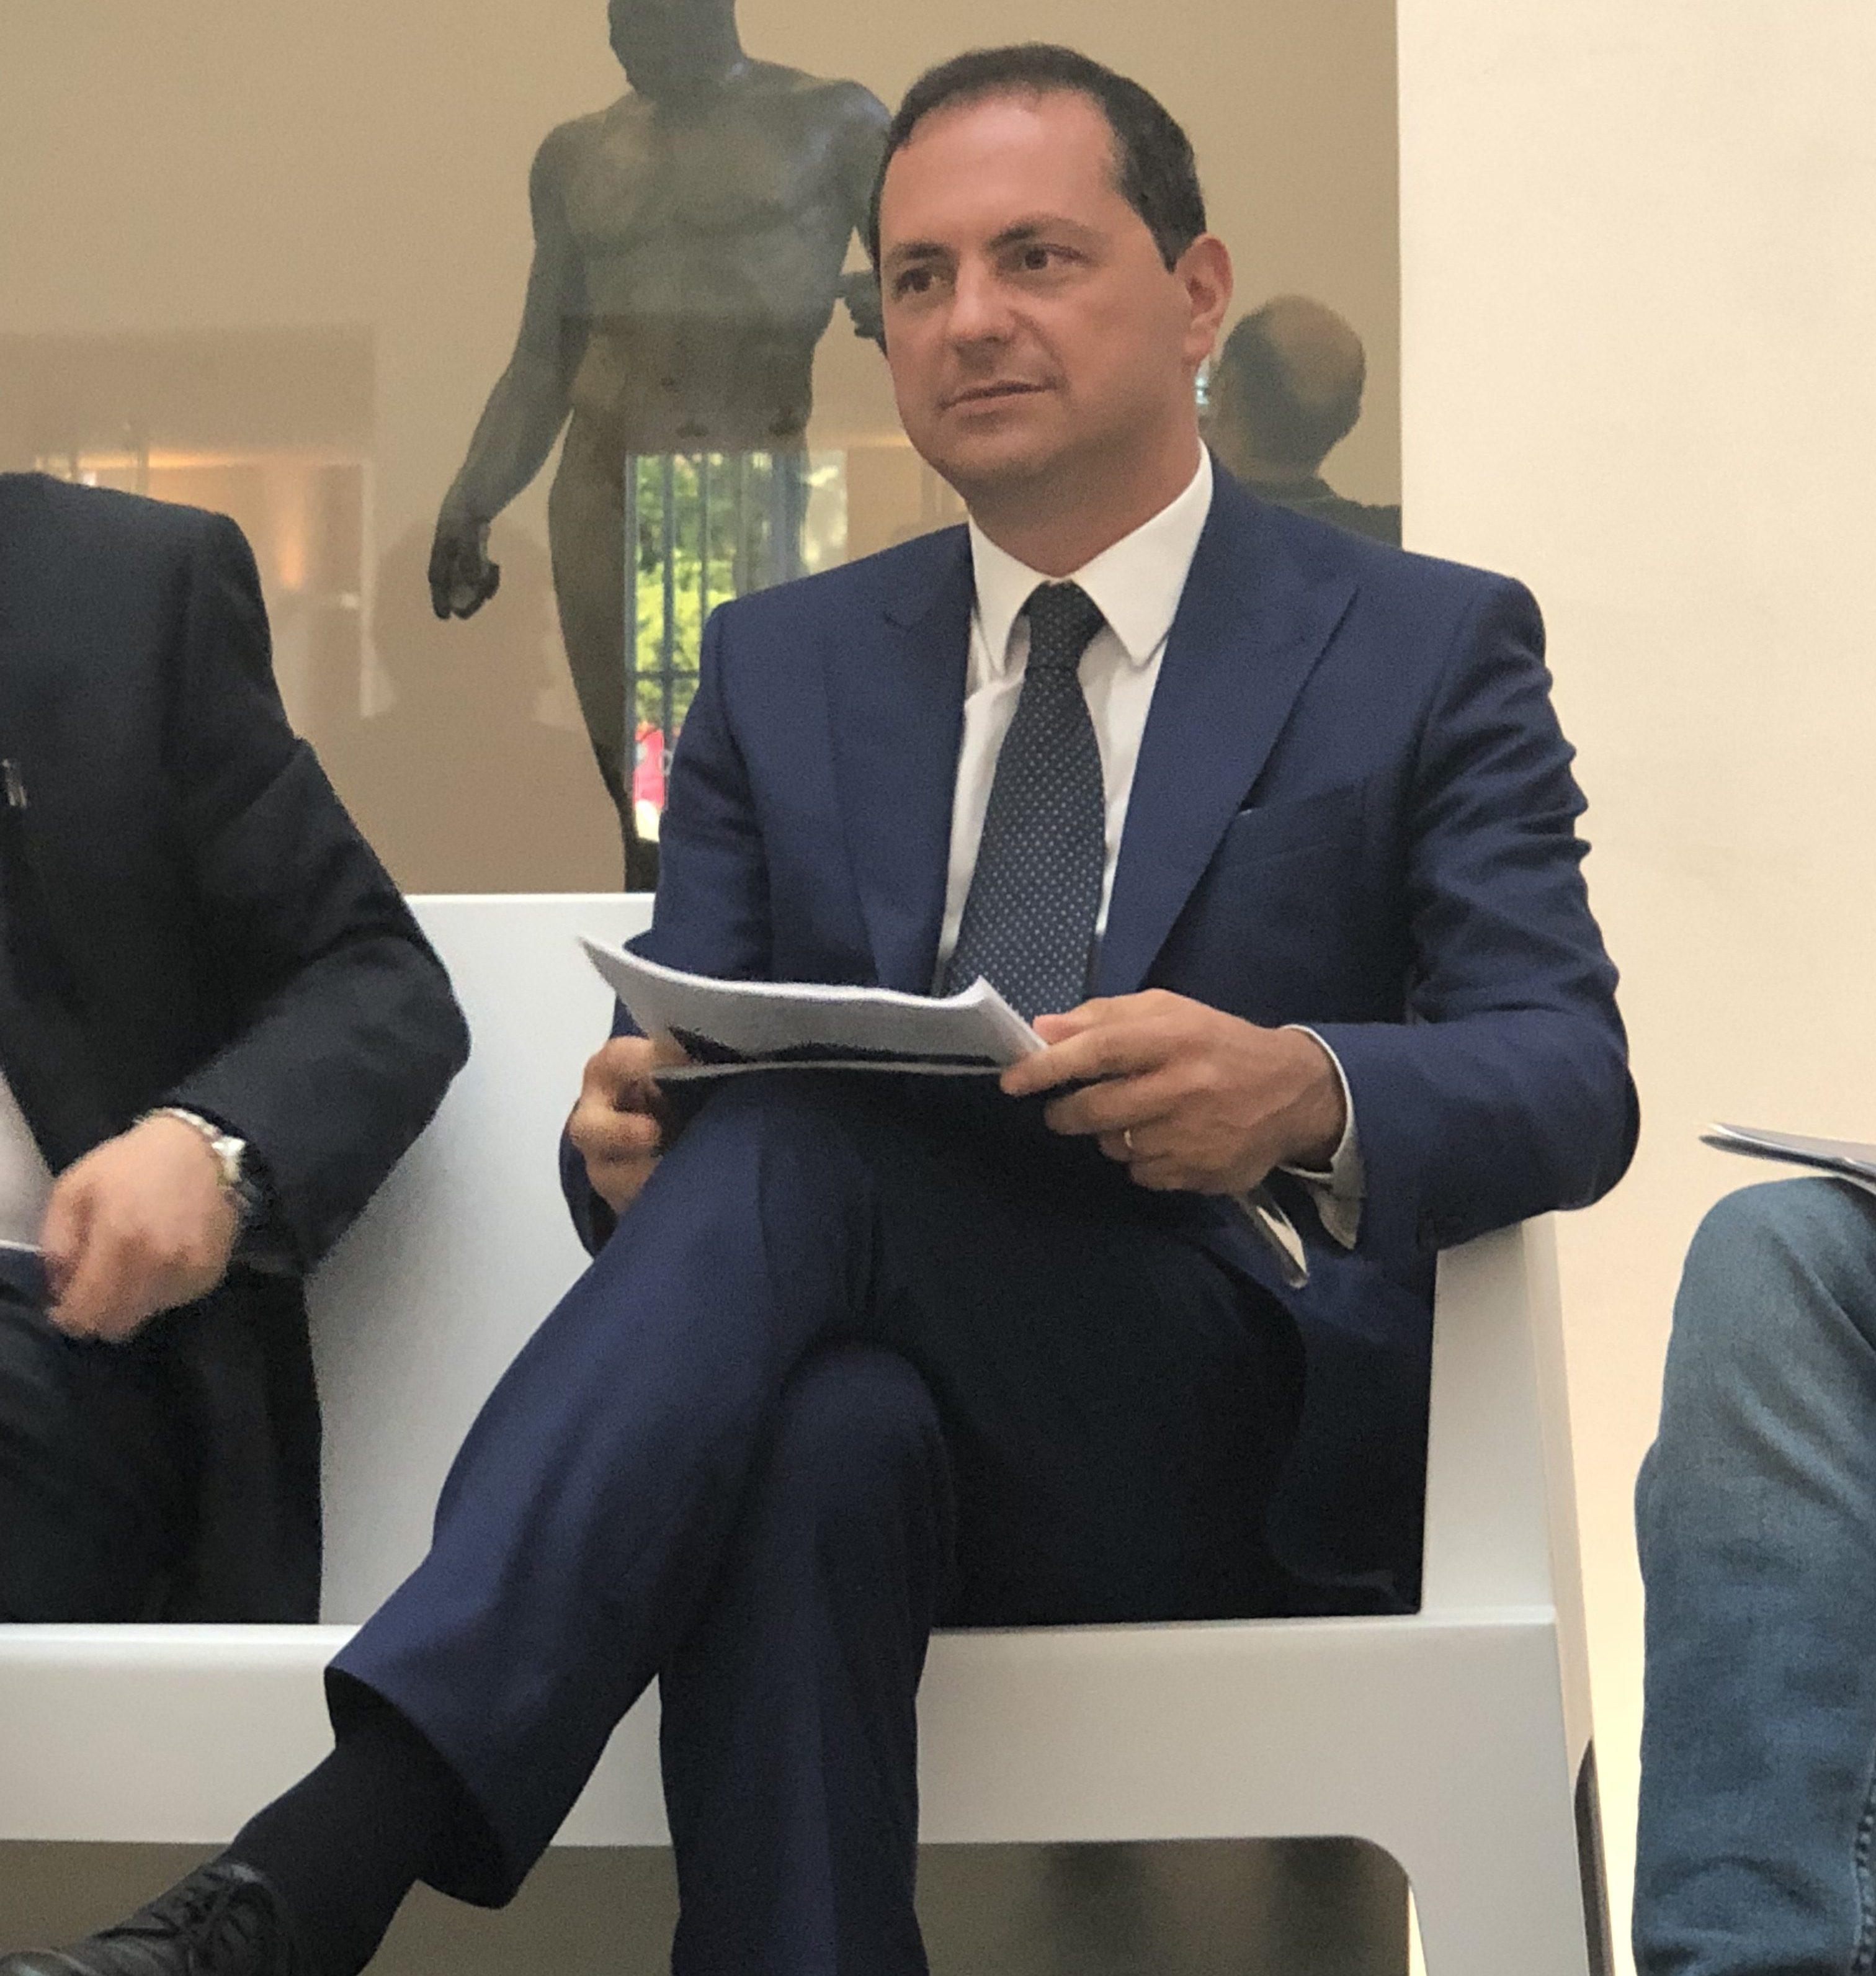 siclari sulla visita del ministro toninelli-LameziaTermeit